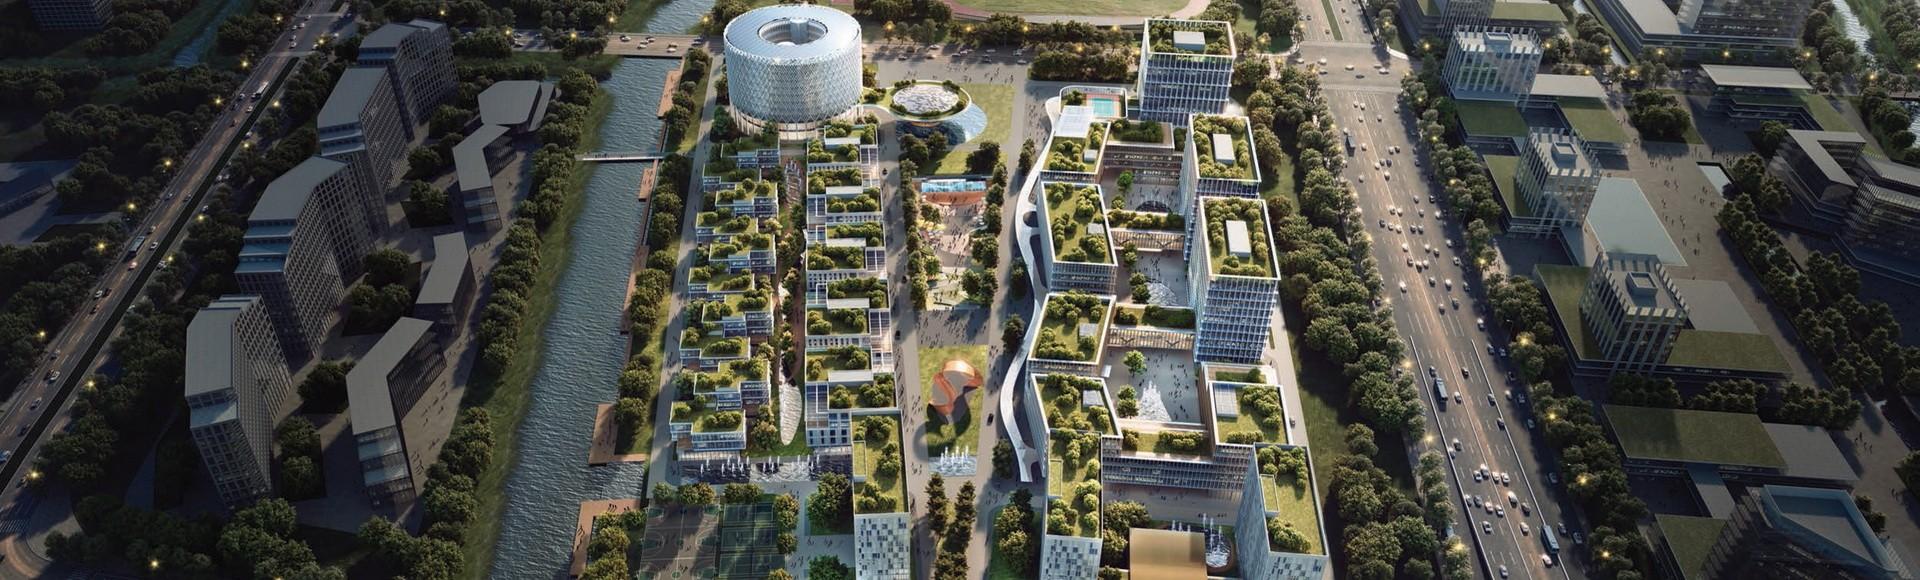 Taicang Intelligent Technology Innovation Park